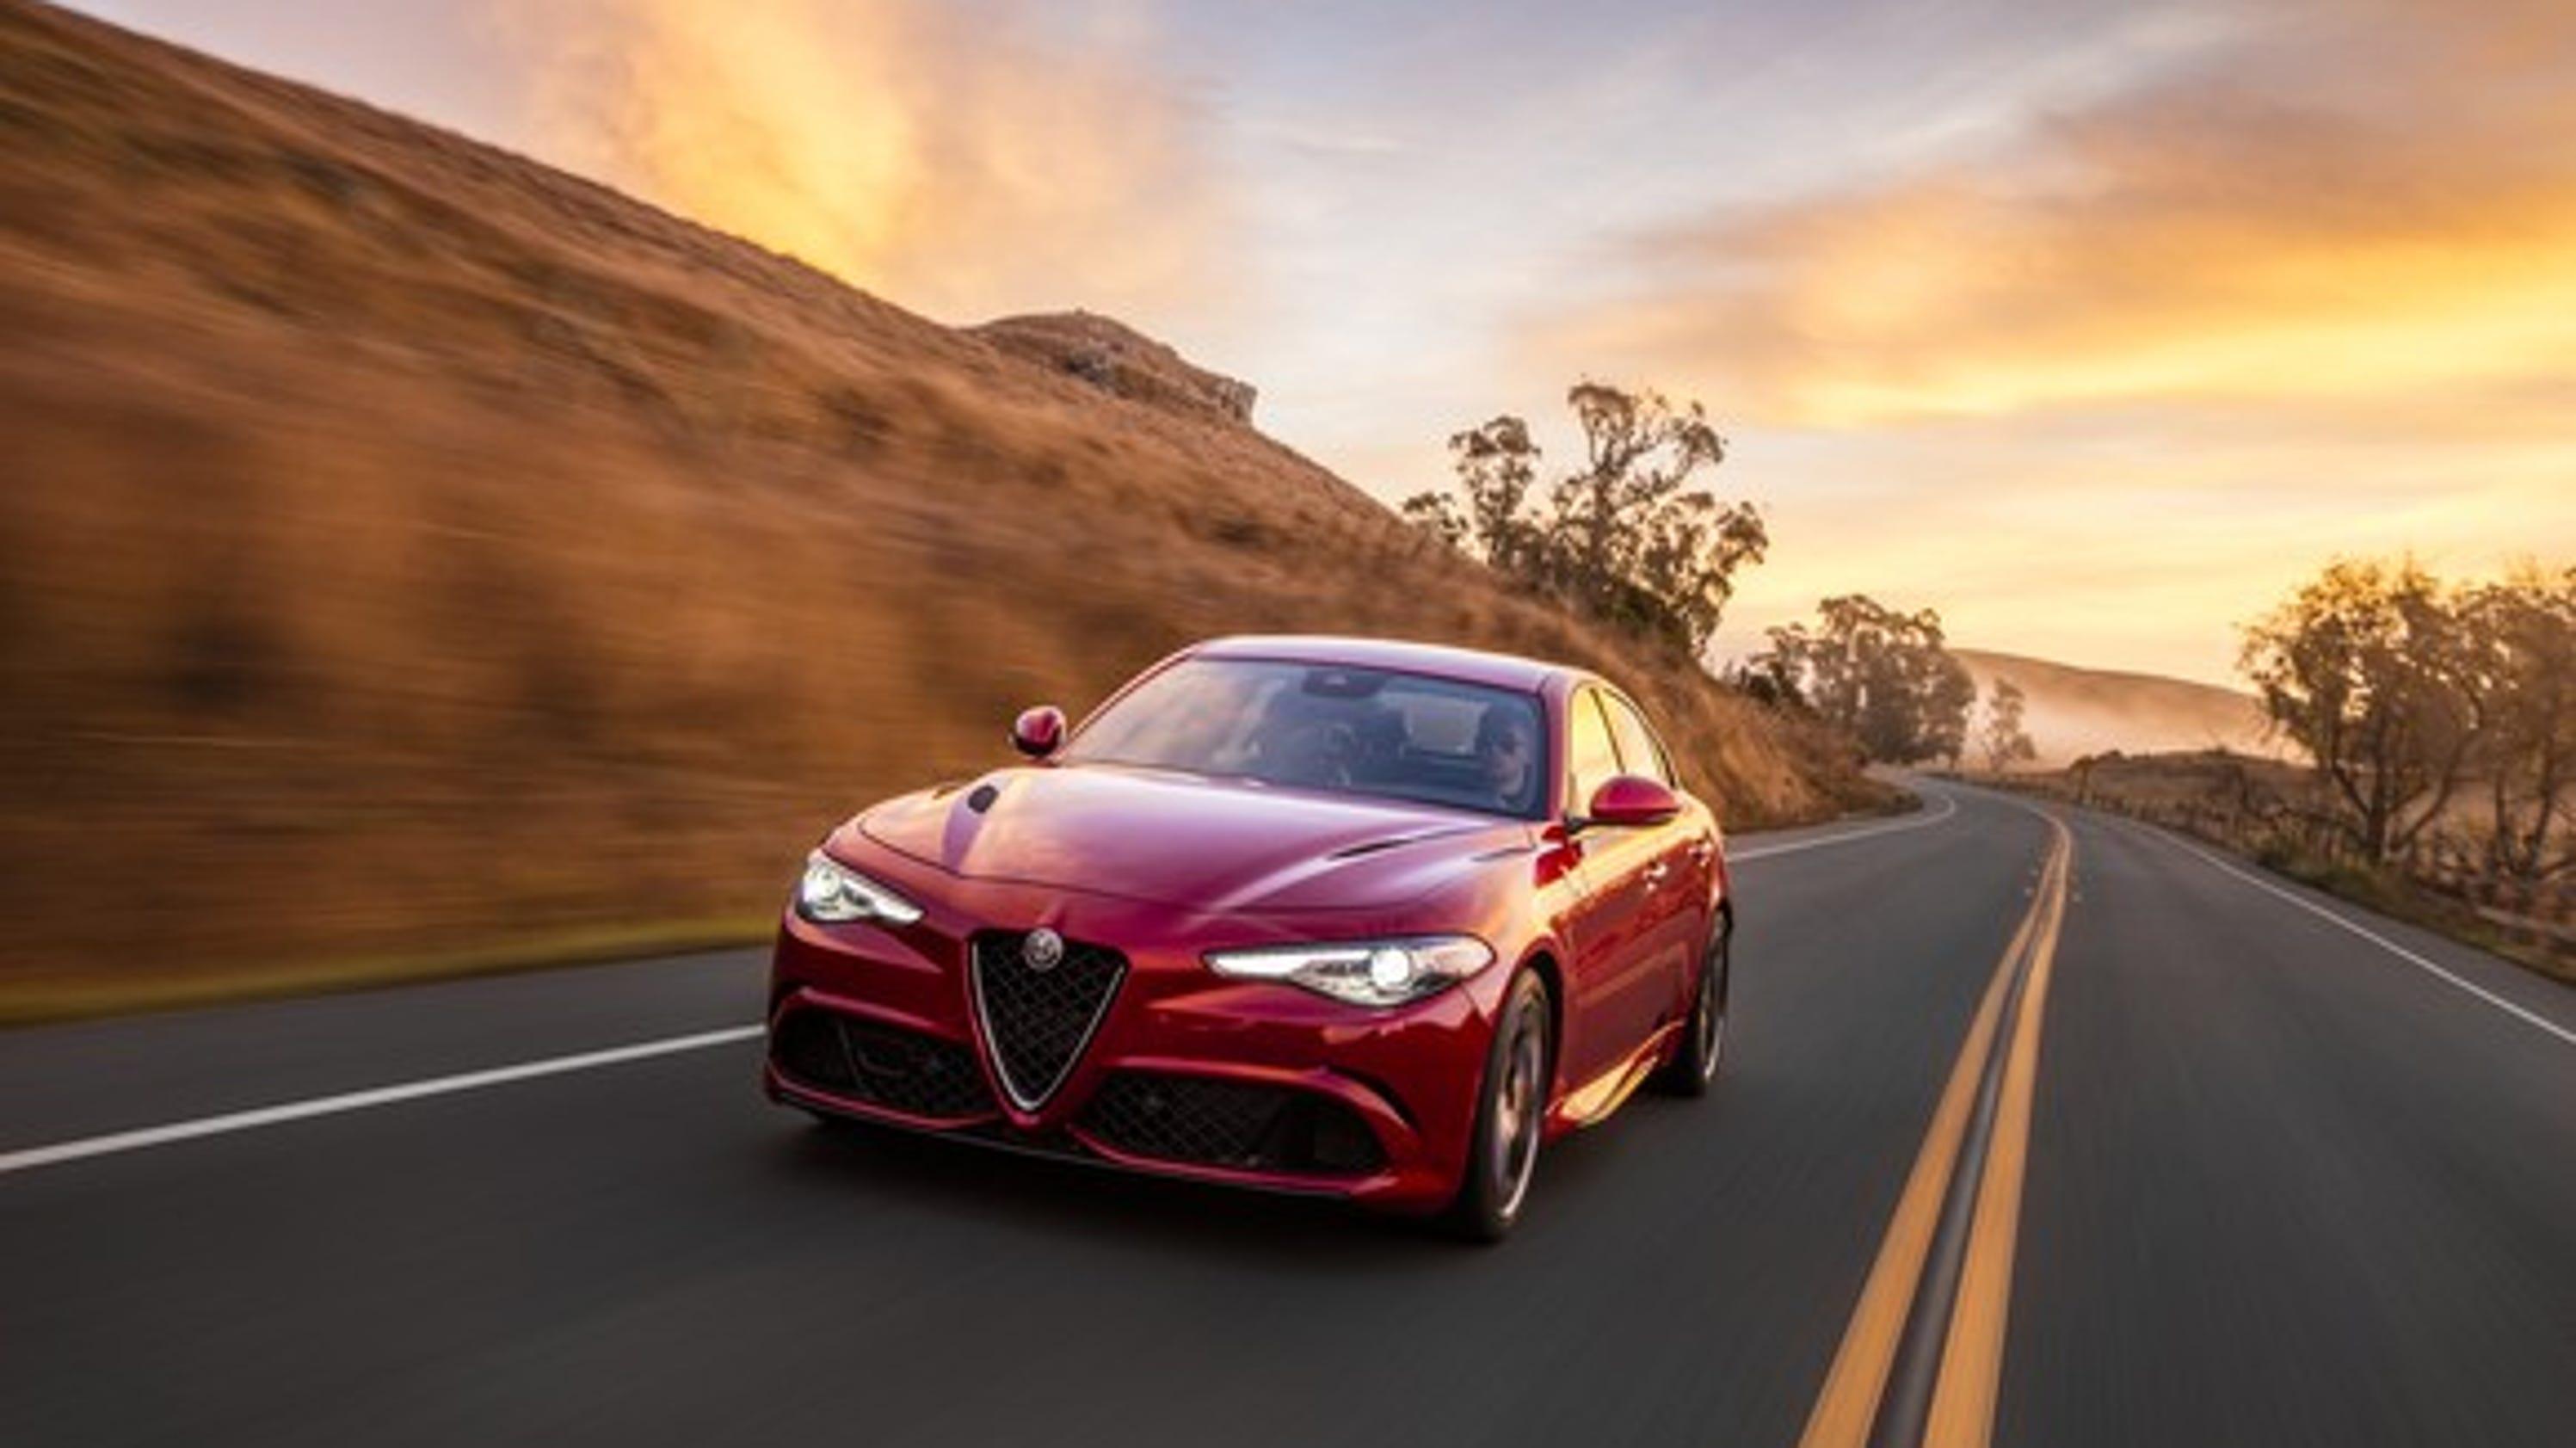 Alfa Romeo Giulia named Motor Trend Car of the Year